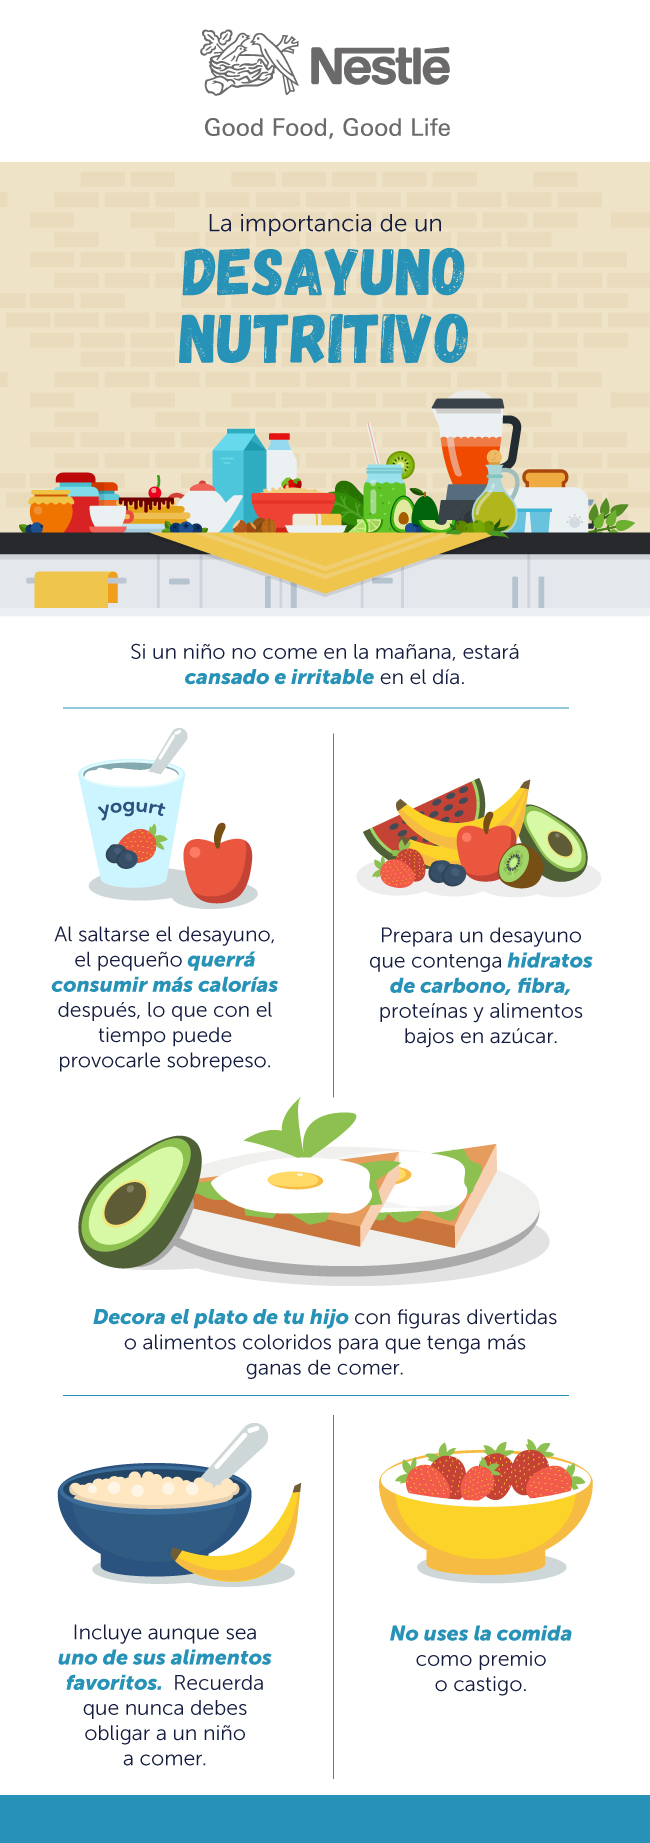 Dieta sana y saludable para ninos